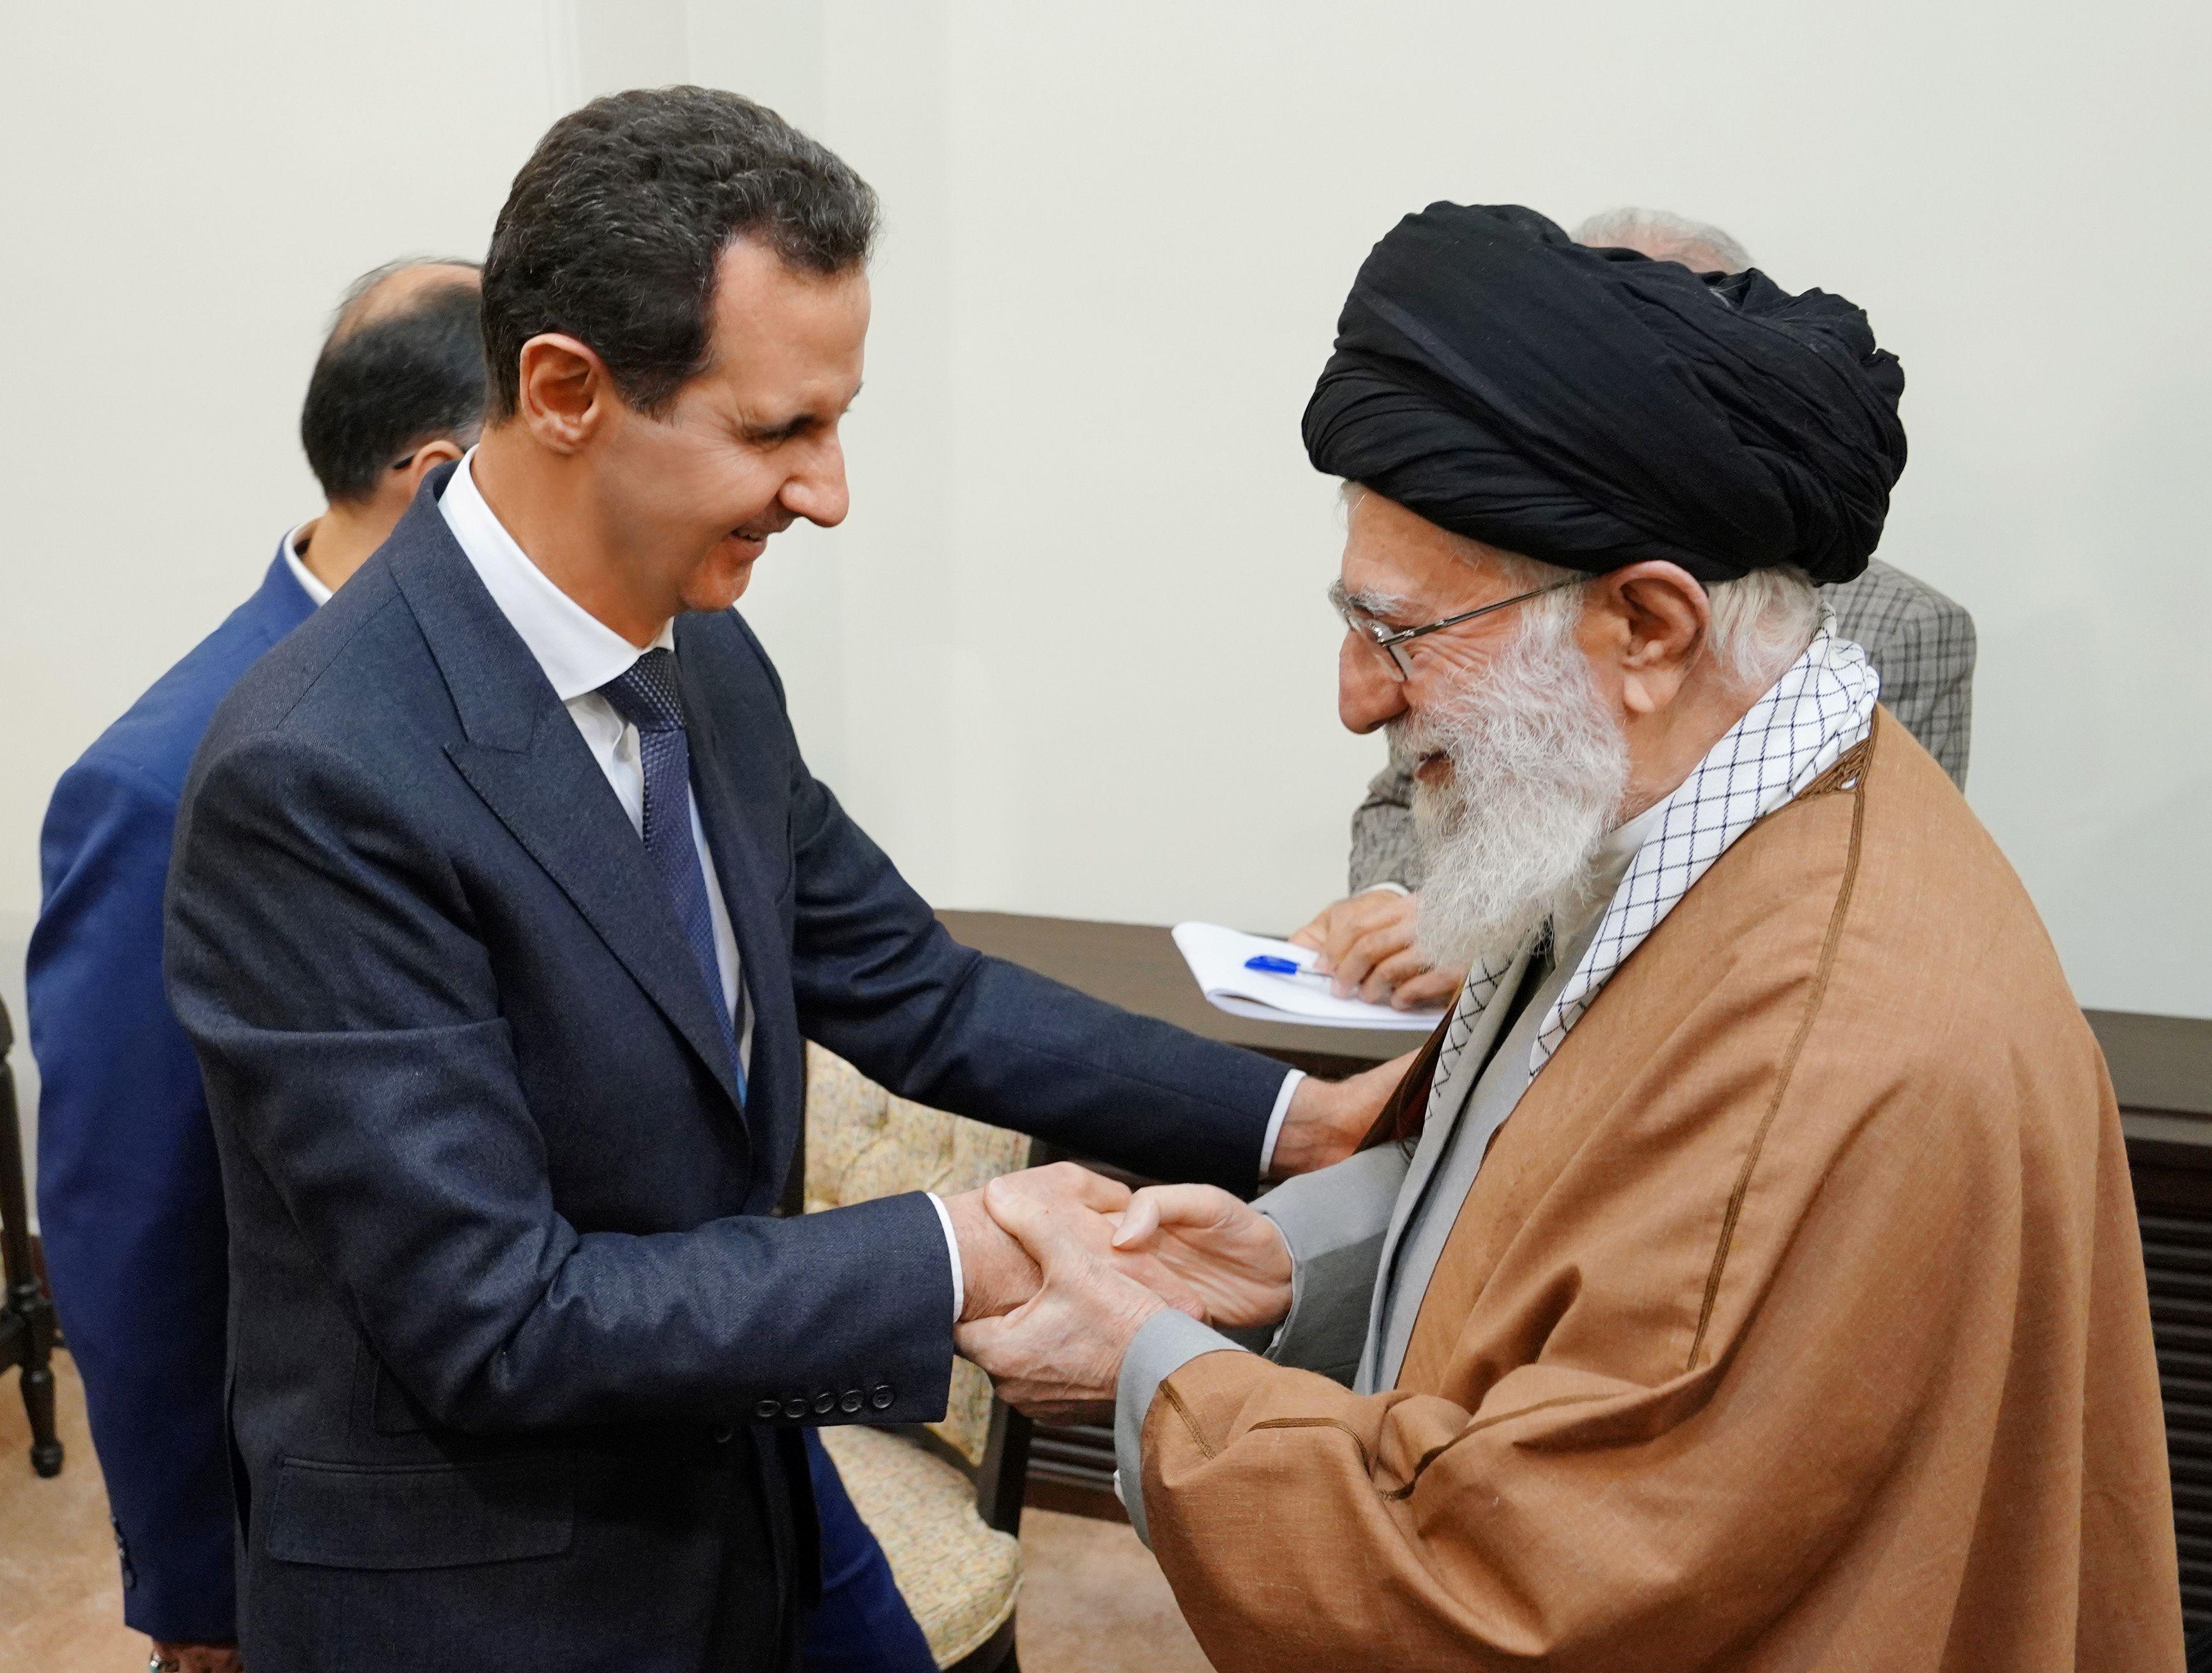 2019-02-25T175951Z_96123046_RC136785FC30_RTRMADP_3_MIDEAST-CRISIS-SYRIA-ASSAD